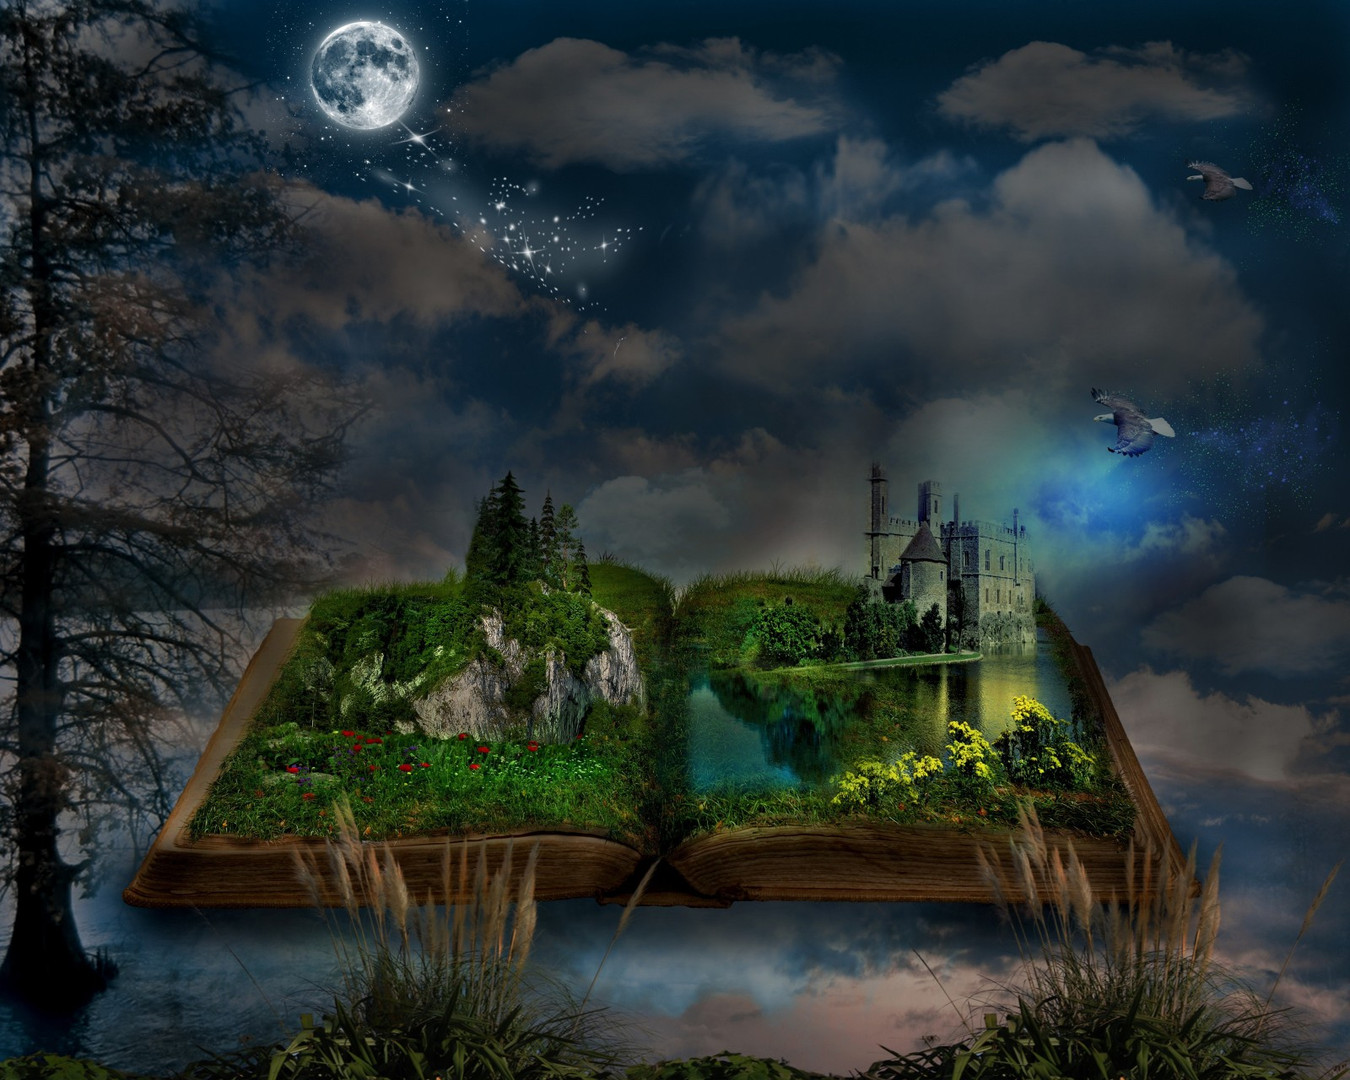 Earth Story Book Wallpaper.jpg